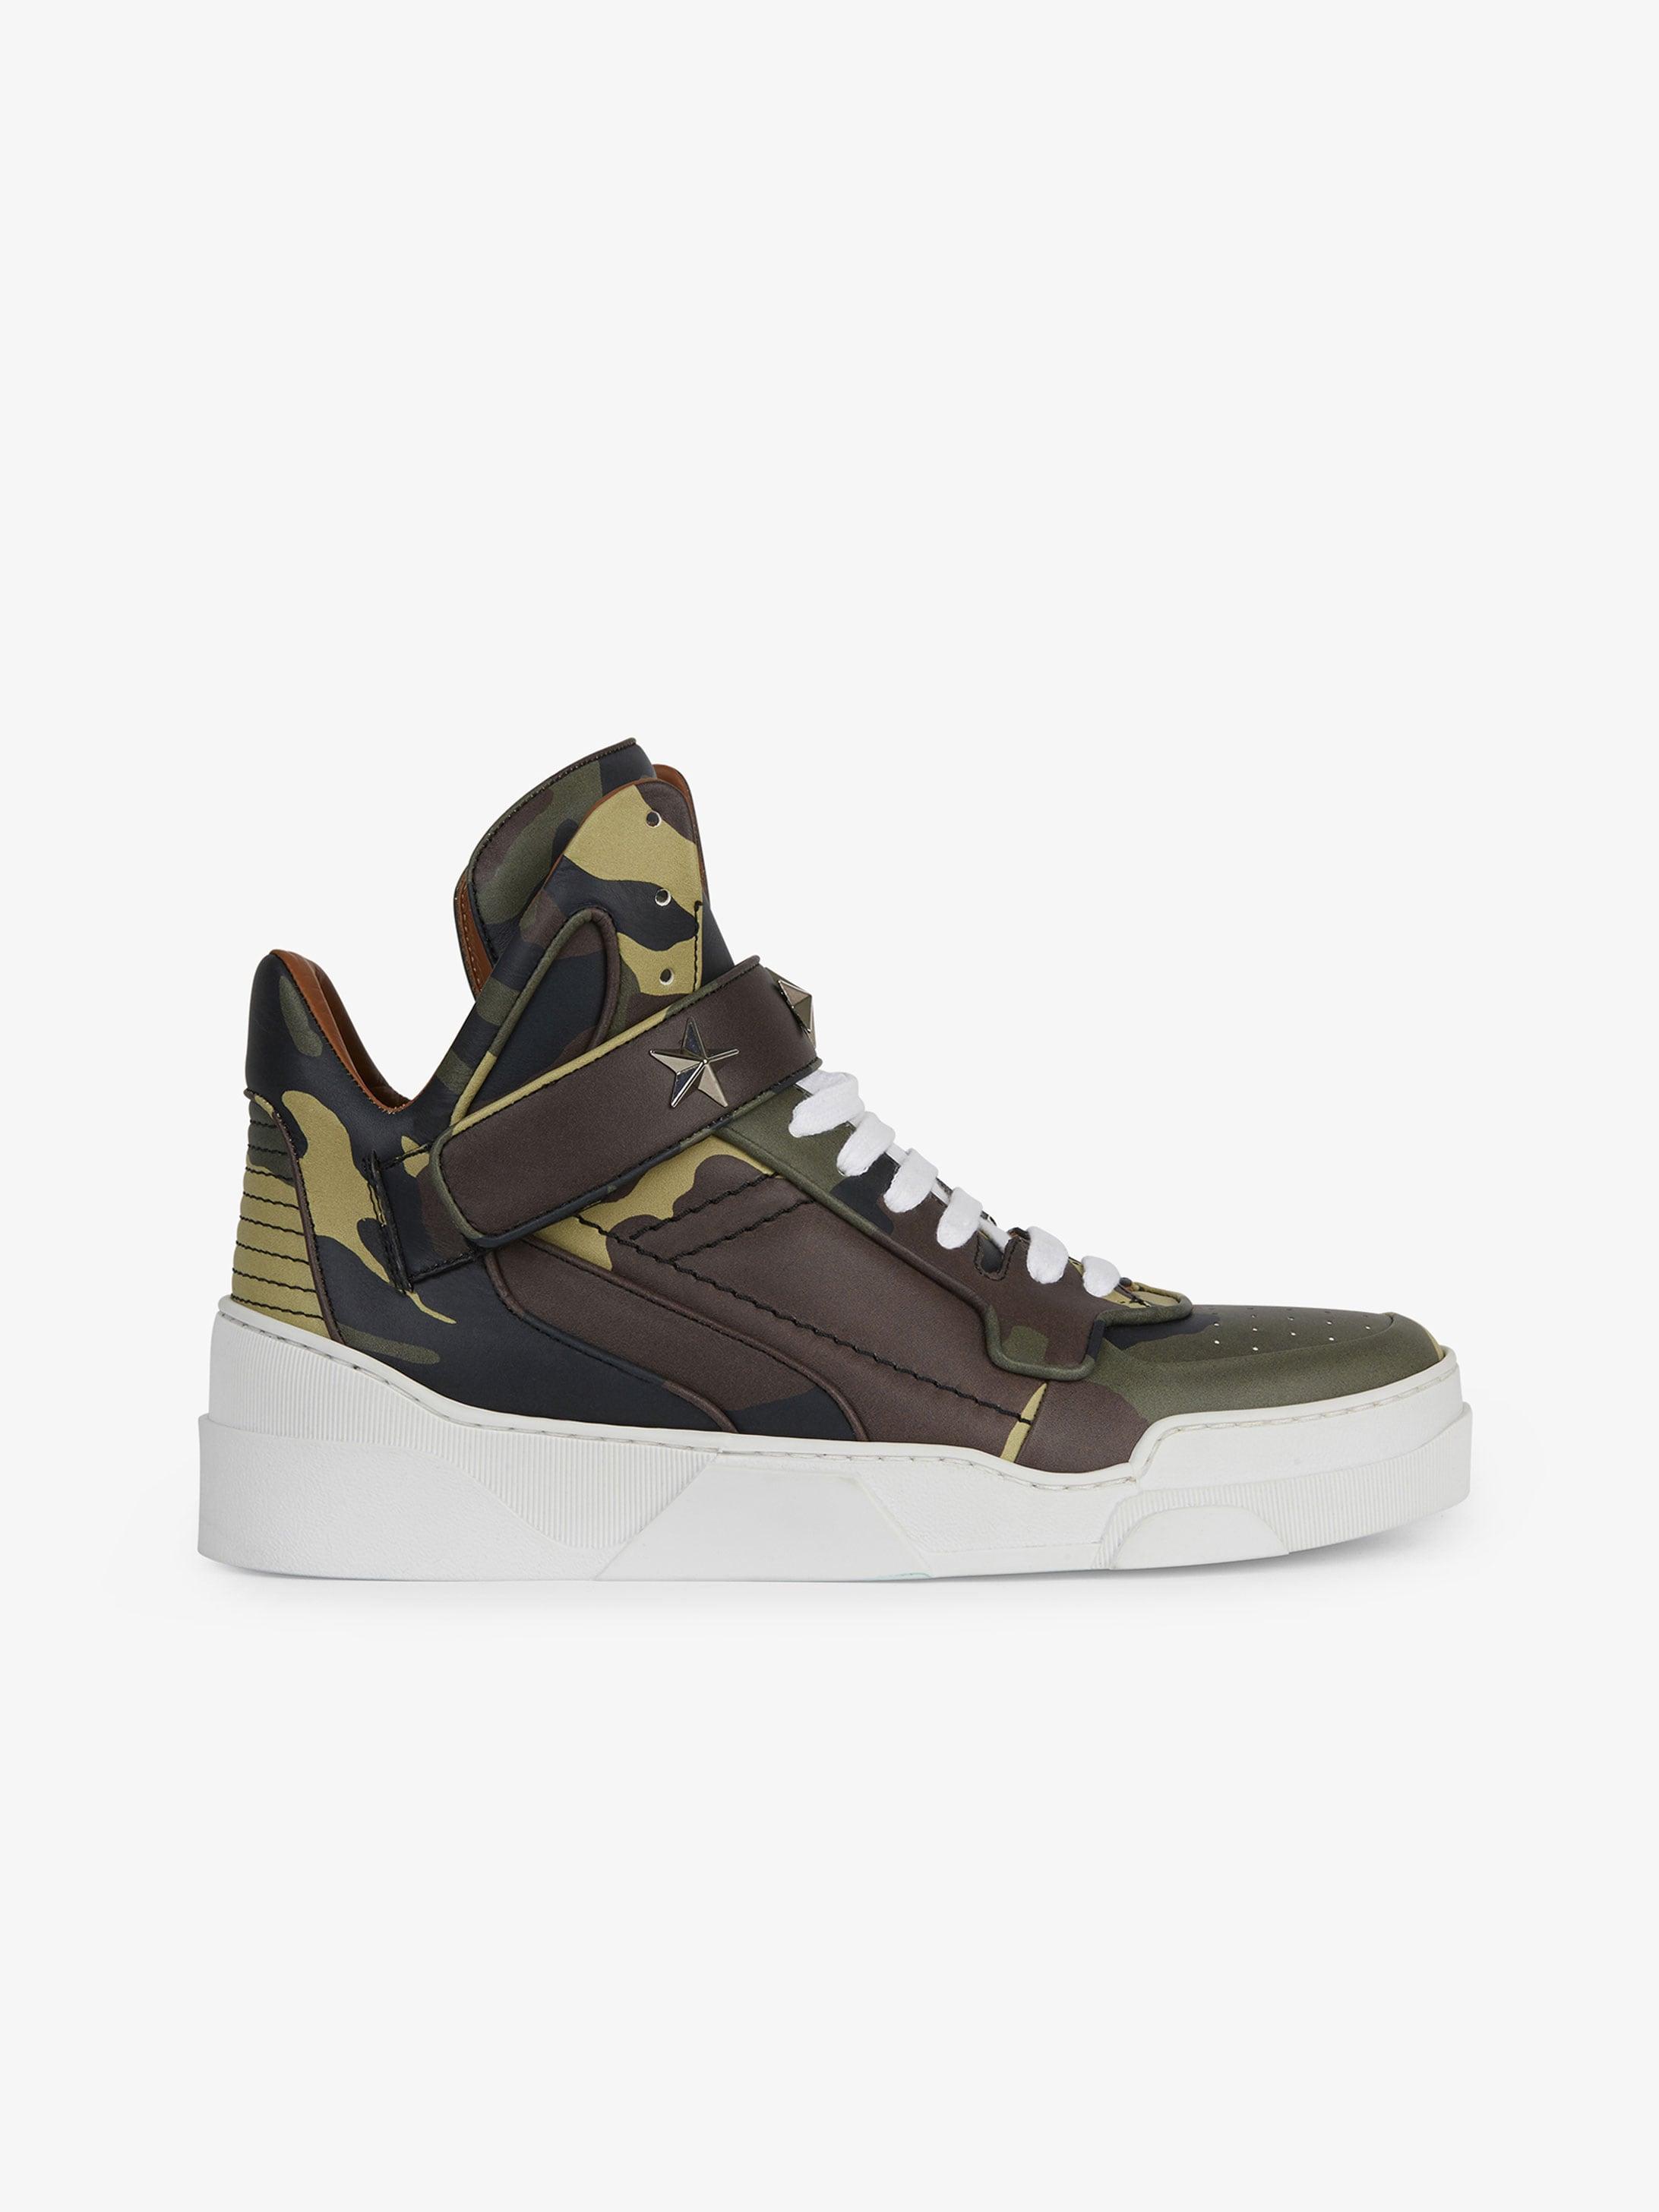 Sneakers montantes en cuir imprimé camouflage